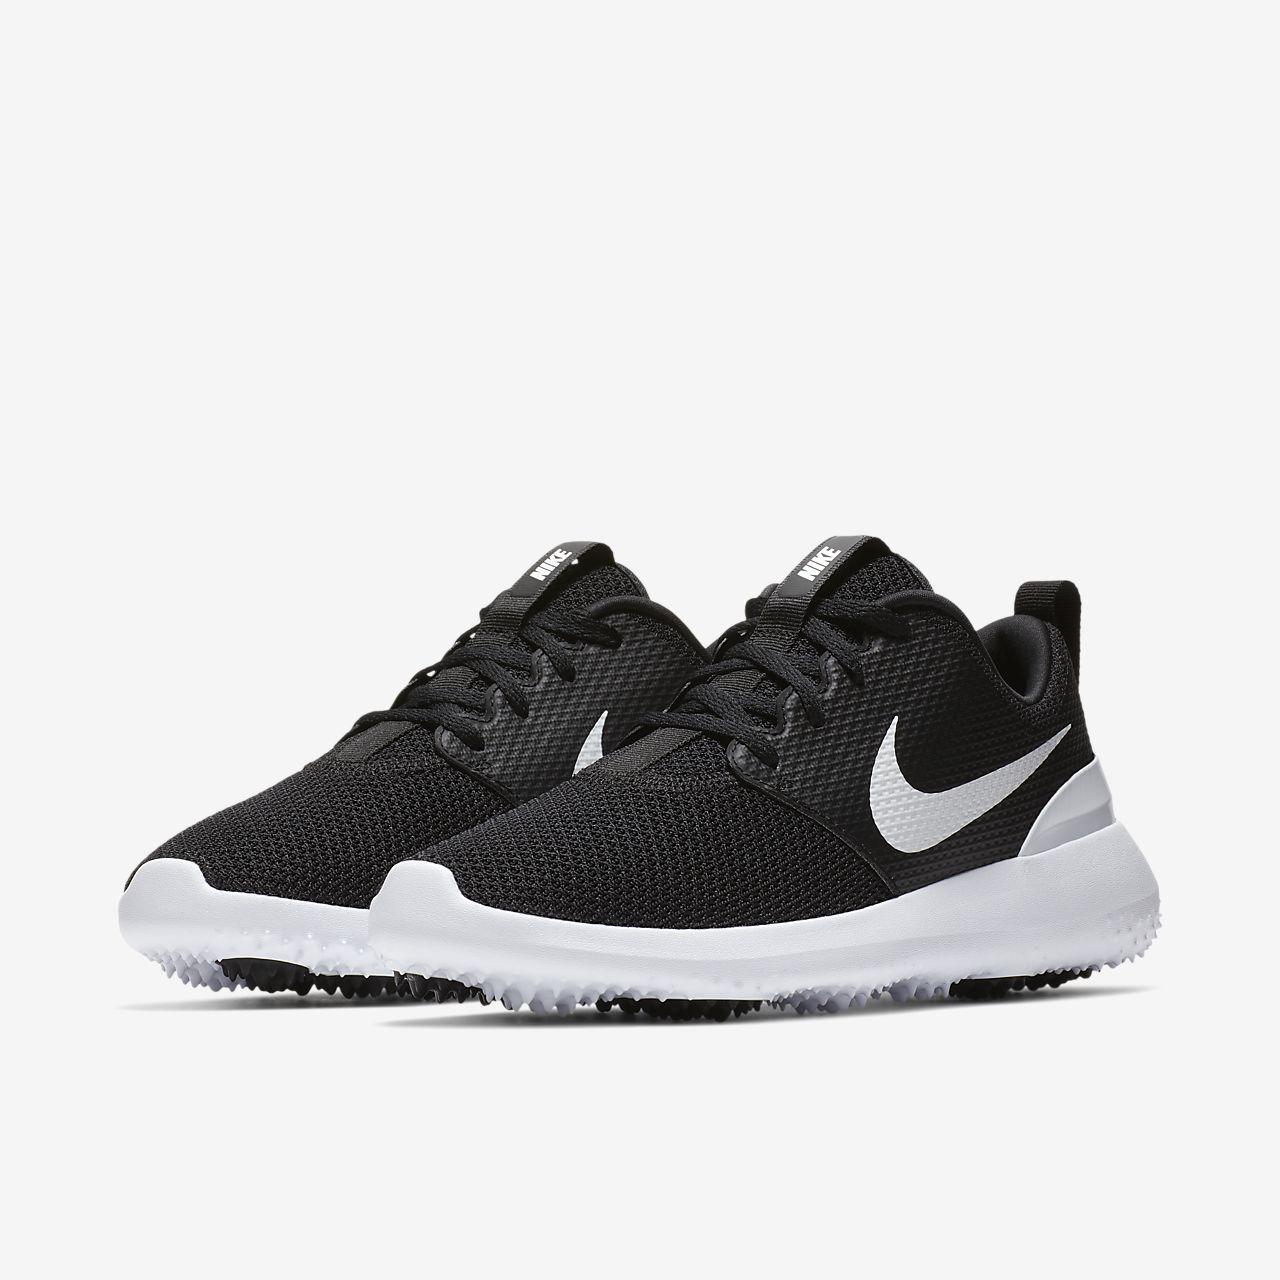 check out 77d4c 56445 Chaussure de golf Nike Roshe G pour Femme. Nike.com FR